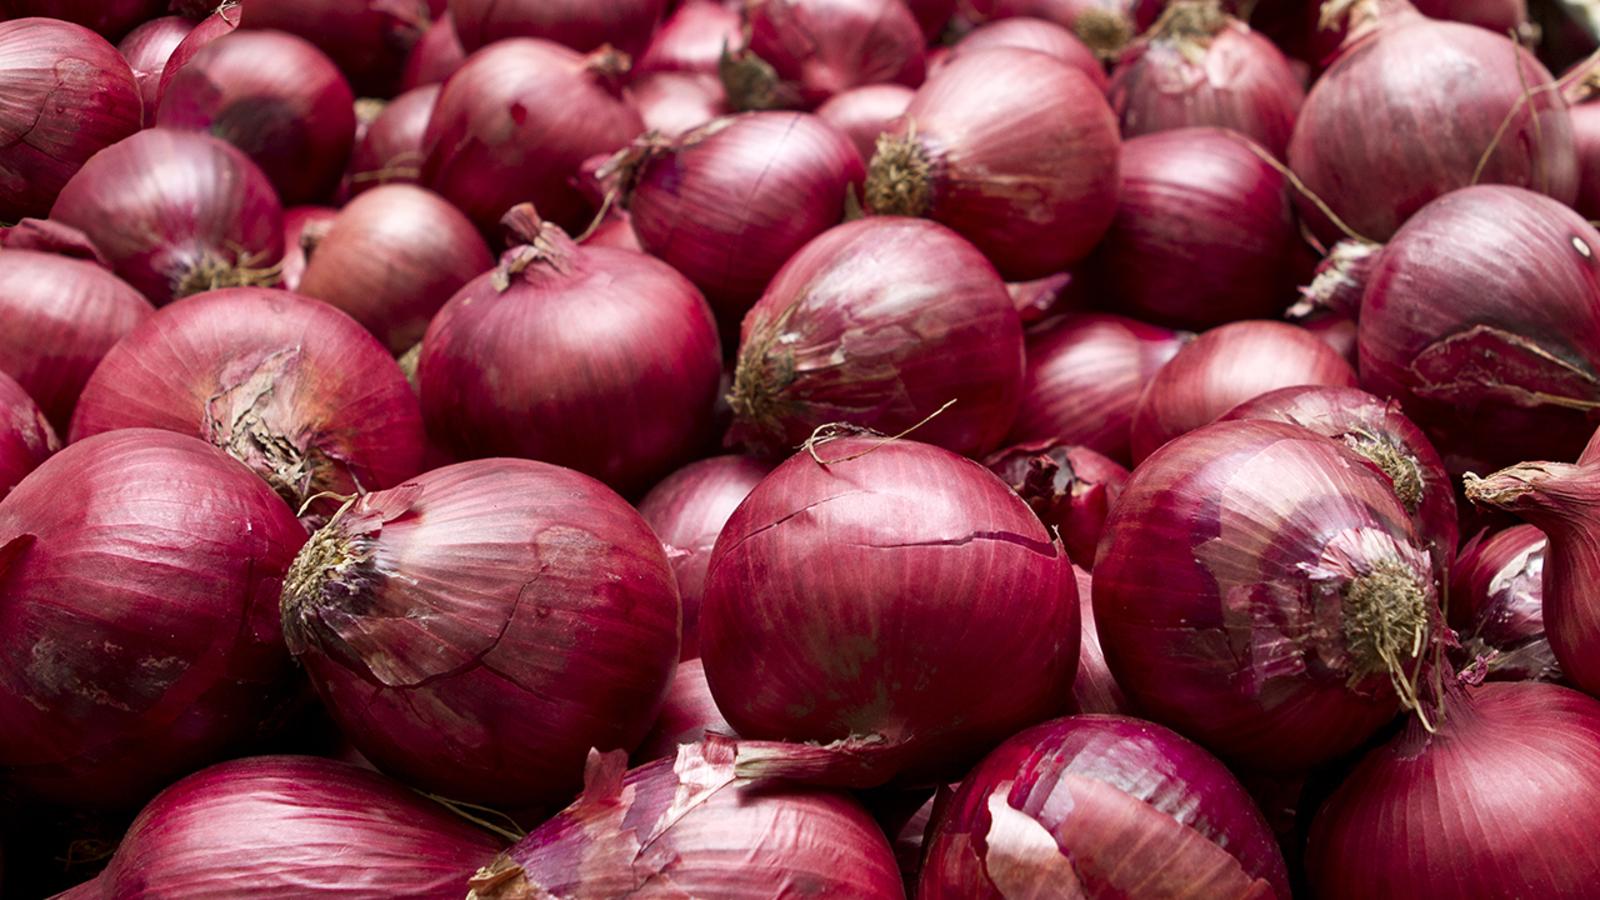 6347104 080120 cc shutterstock red onions img jpg?w=1600.'